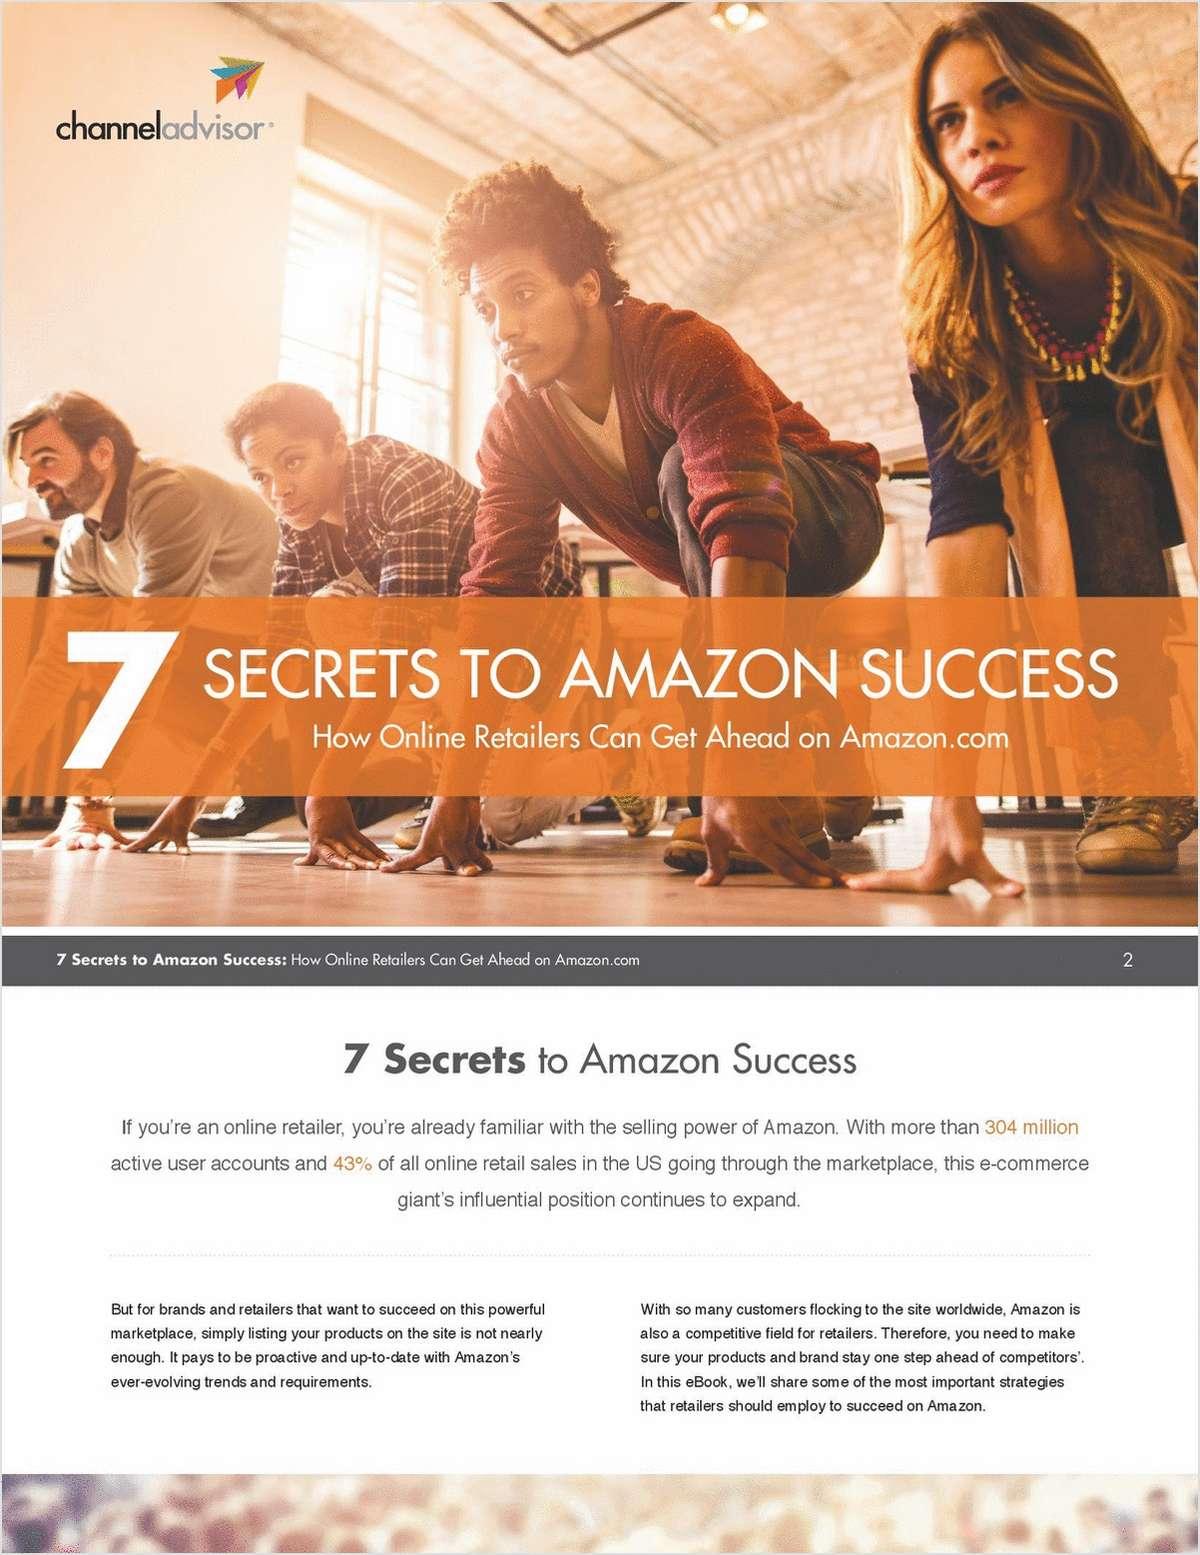 7 Secrets to Amazon Success